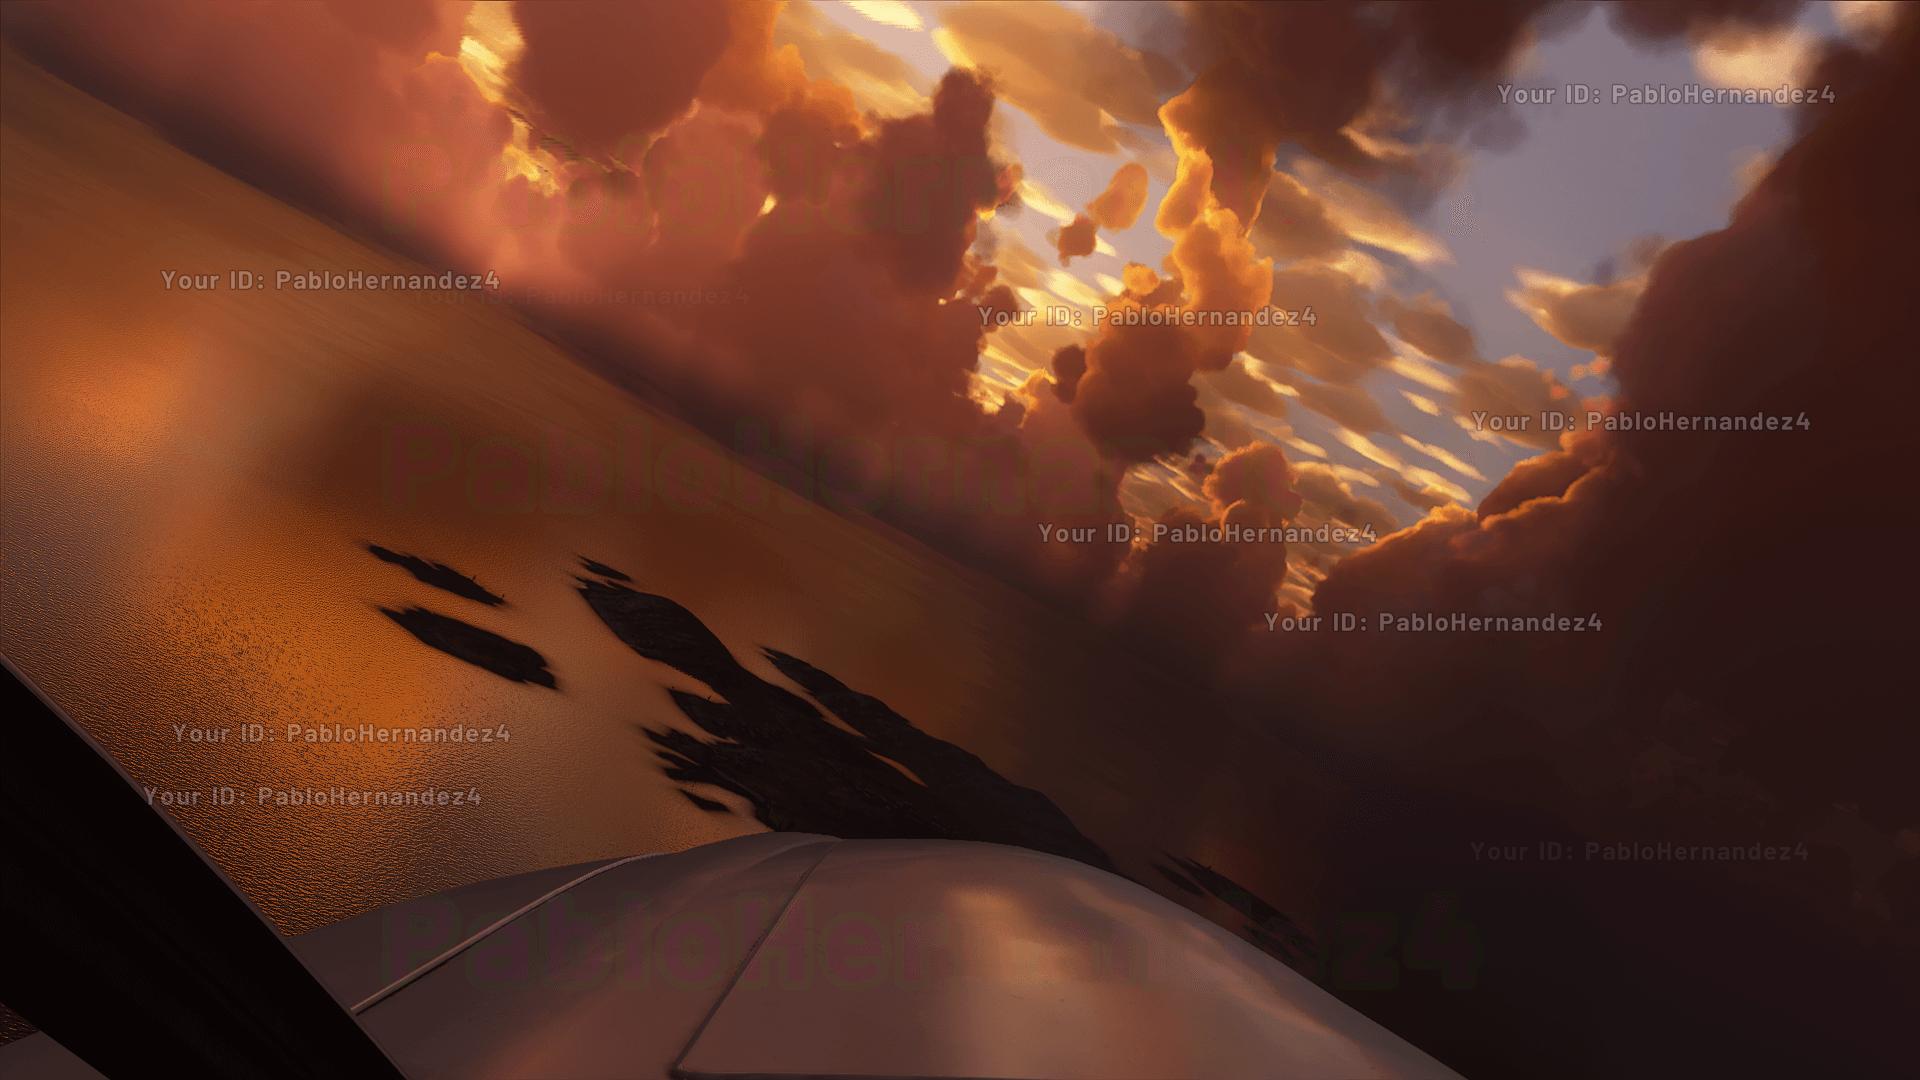 Desktop-Screenshot-2020.08.10-22.50.54.4